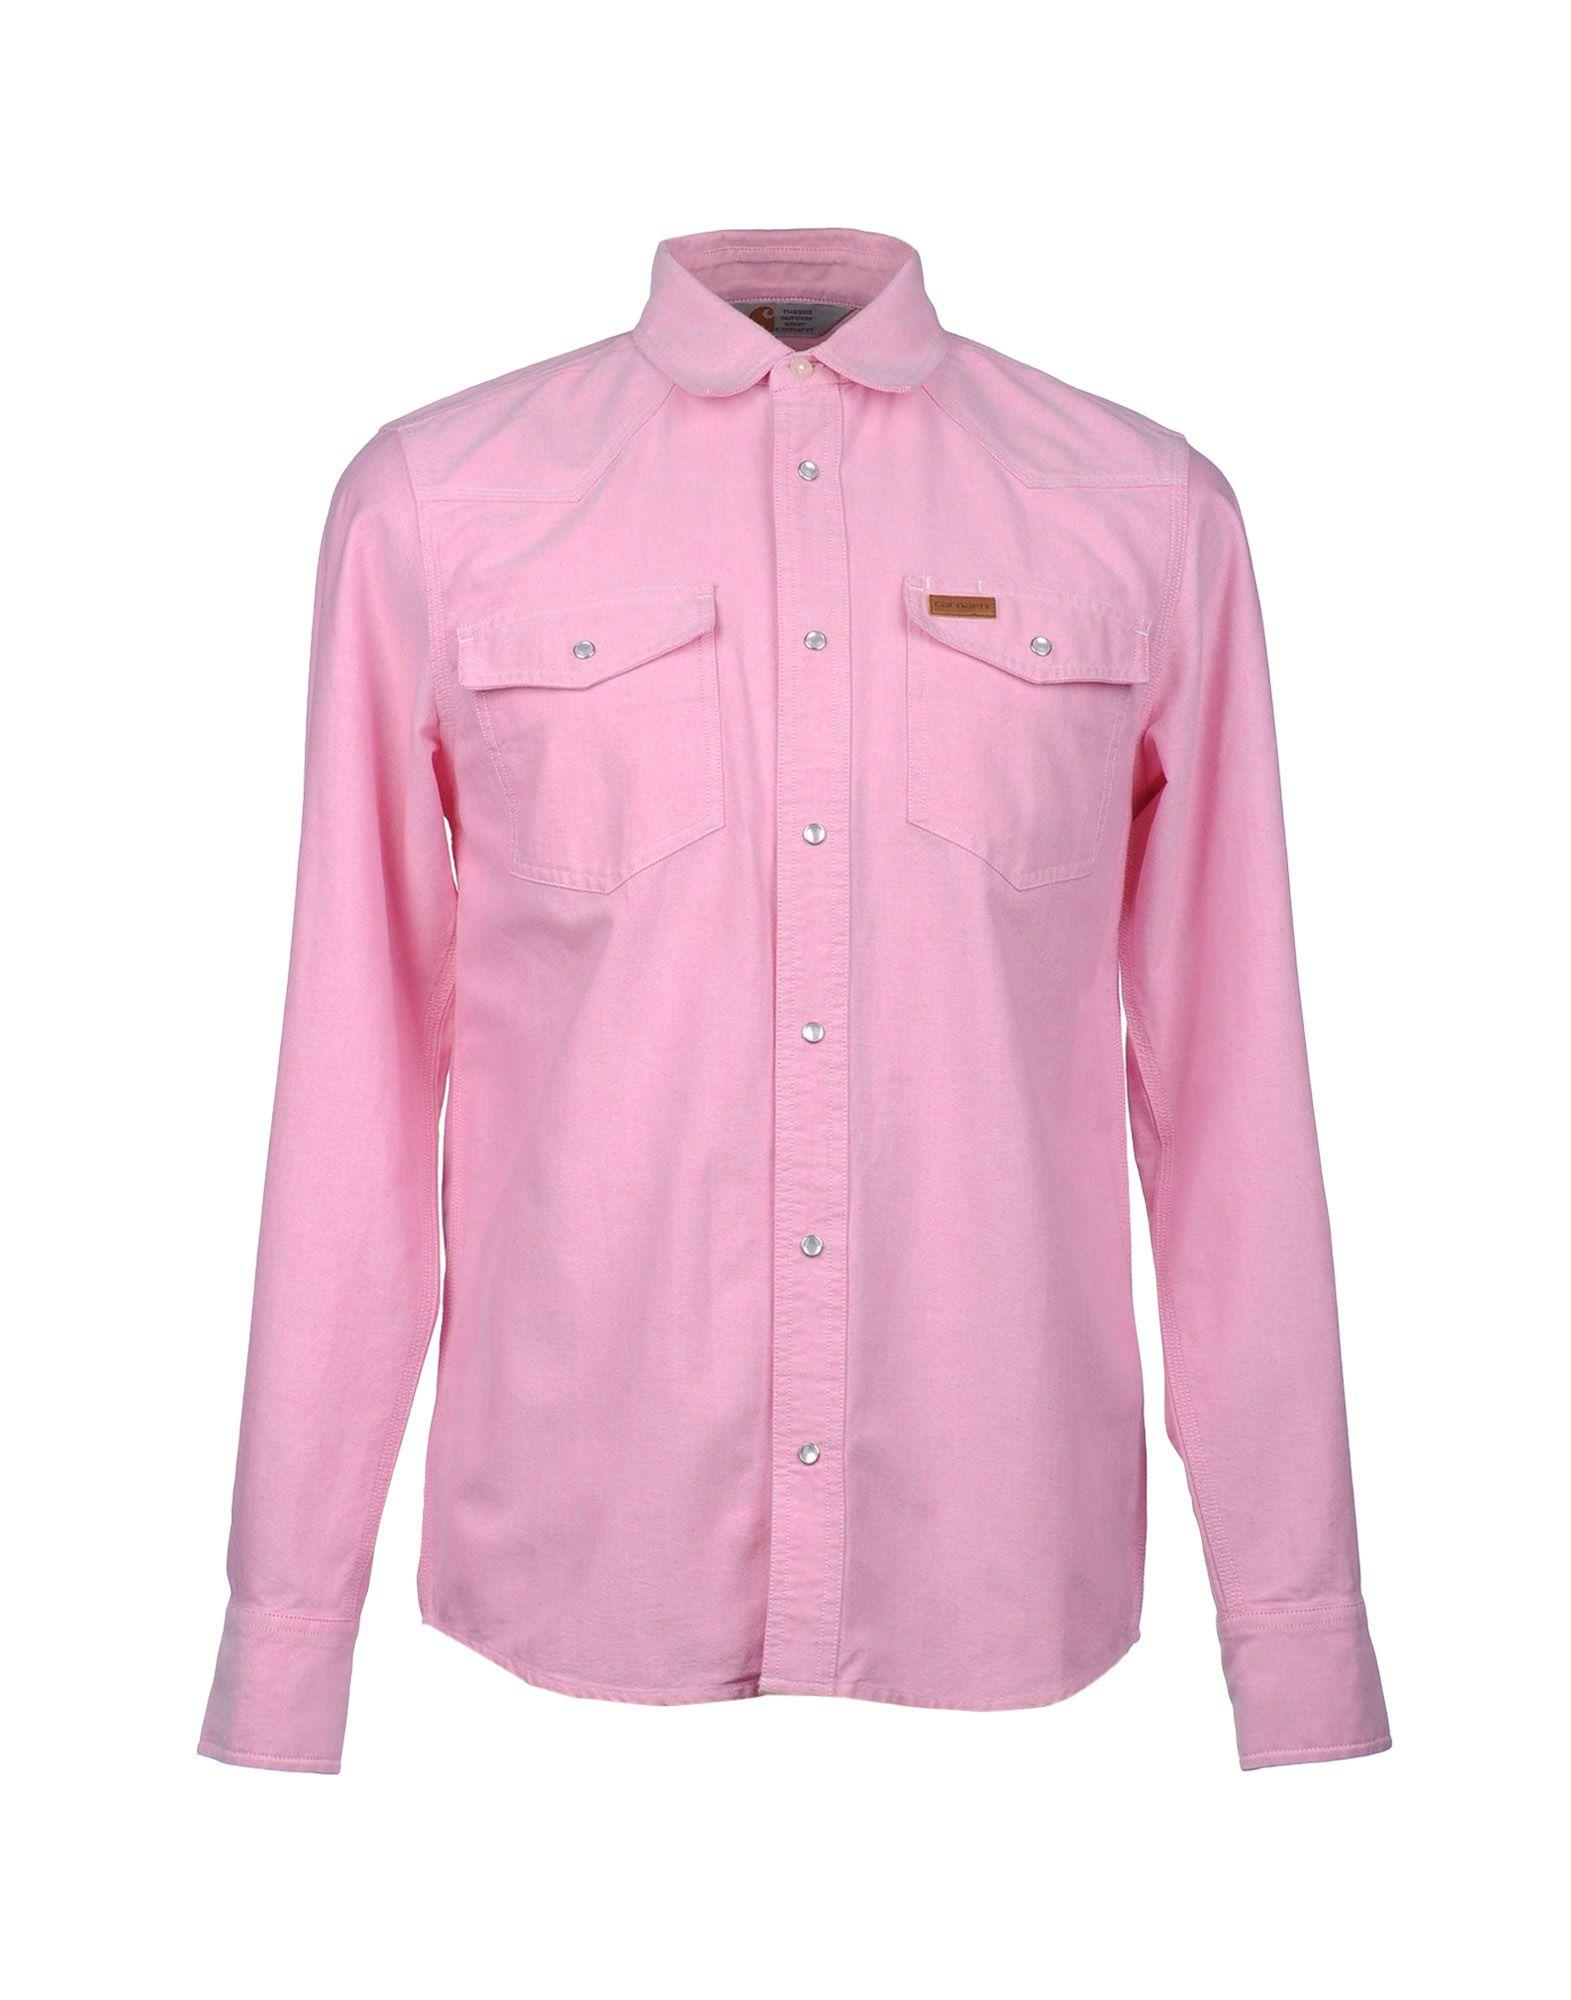 Carhartt long sleeve shirt in pink for men lyst for Mens pink long sleeve shirt